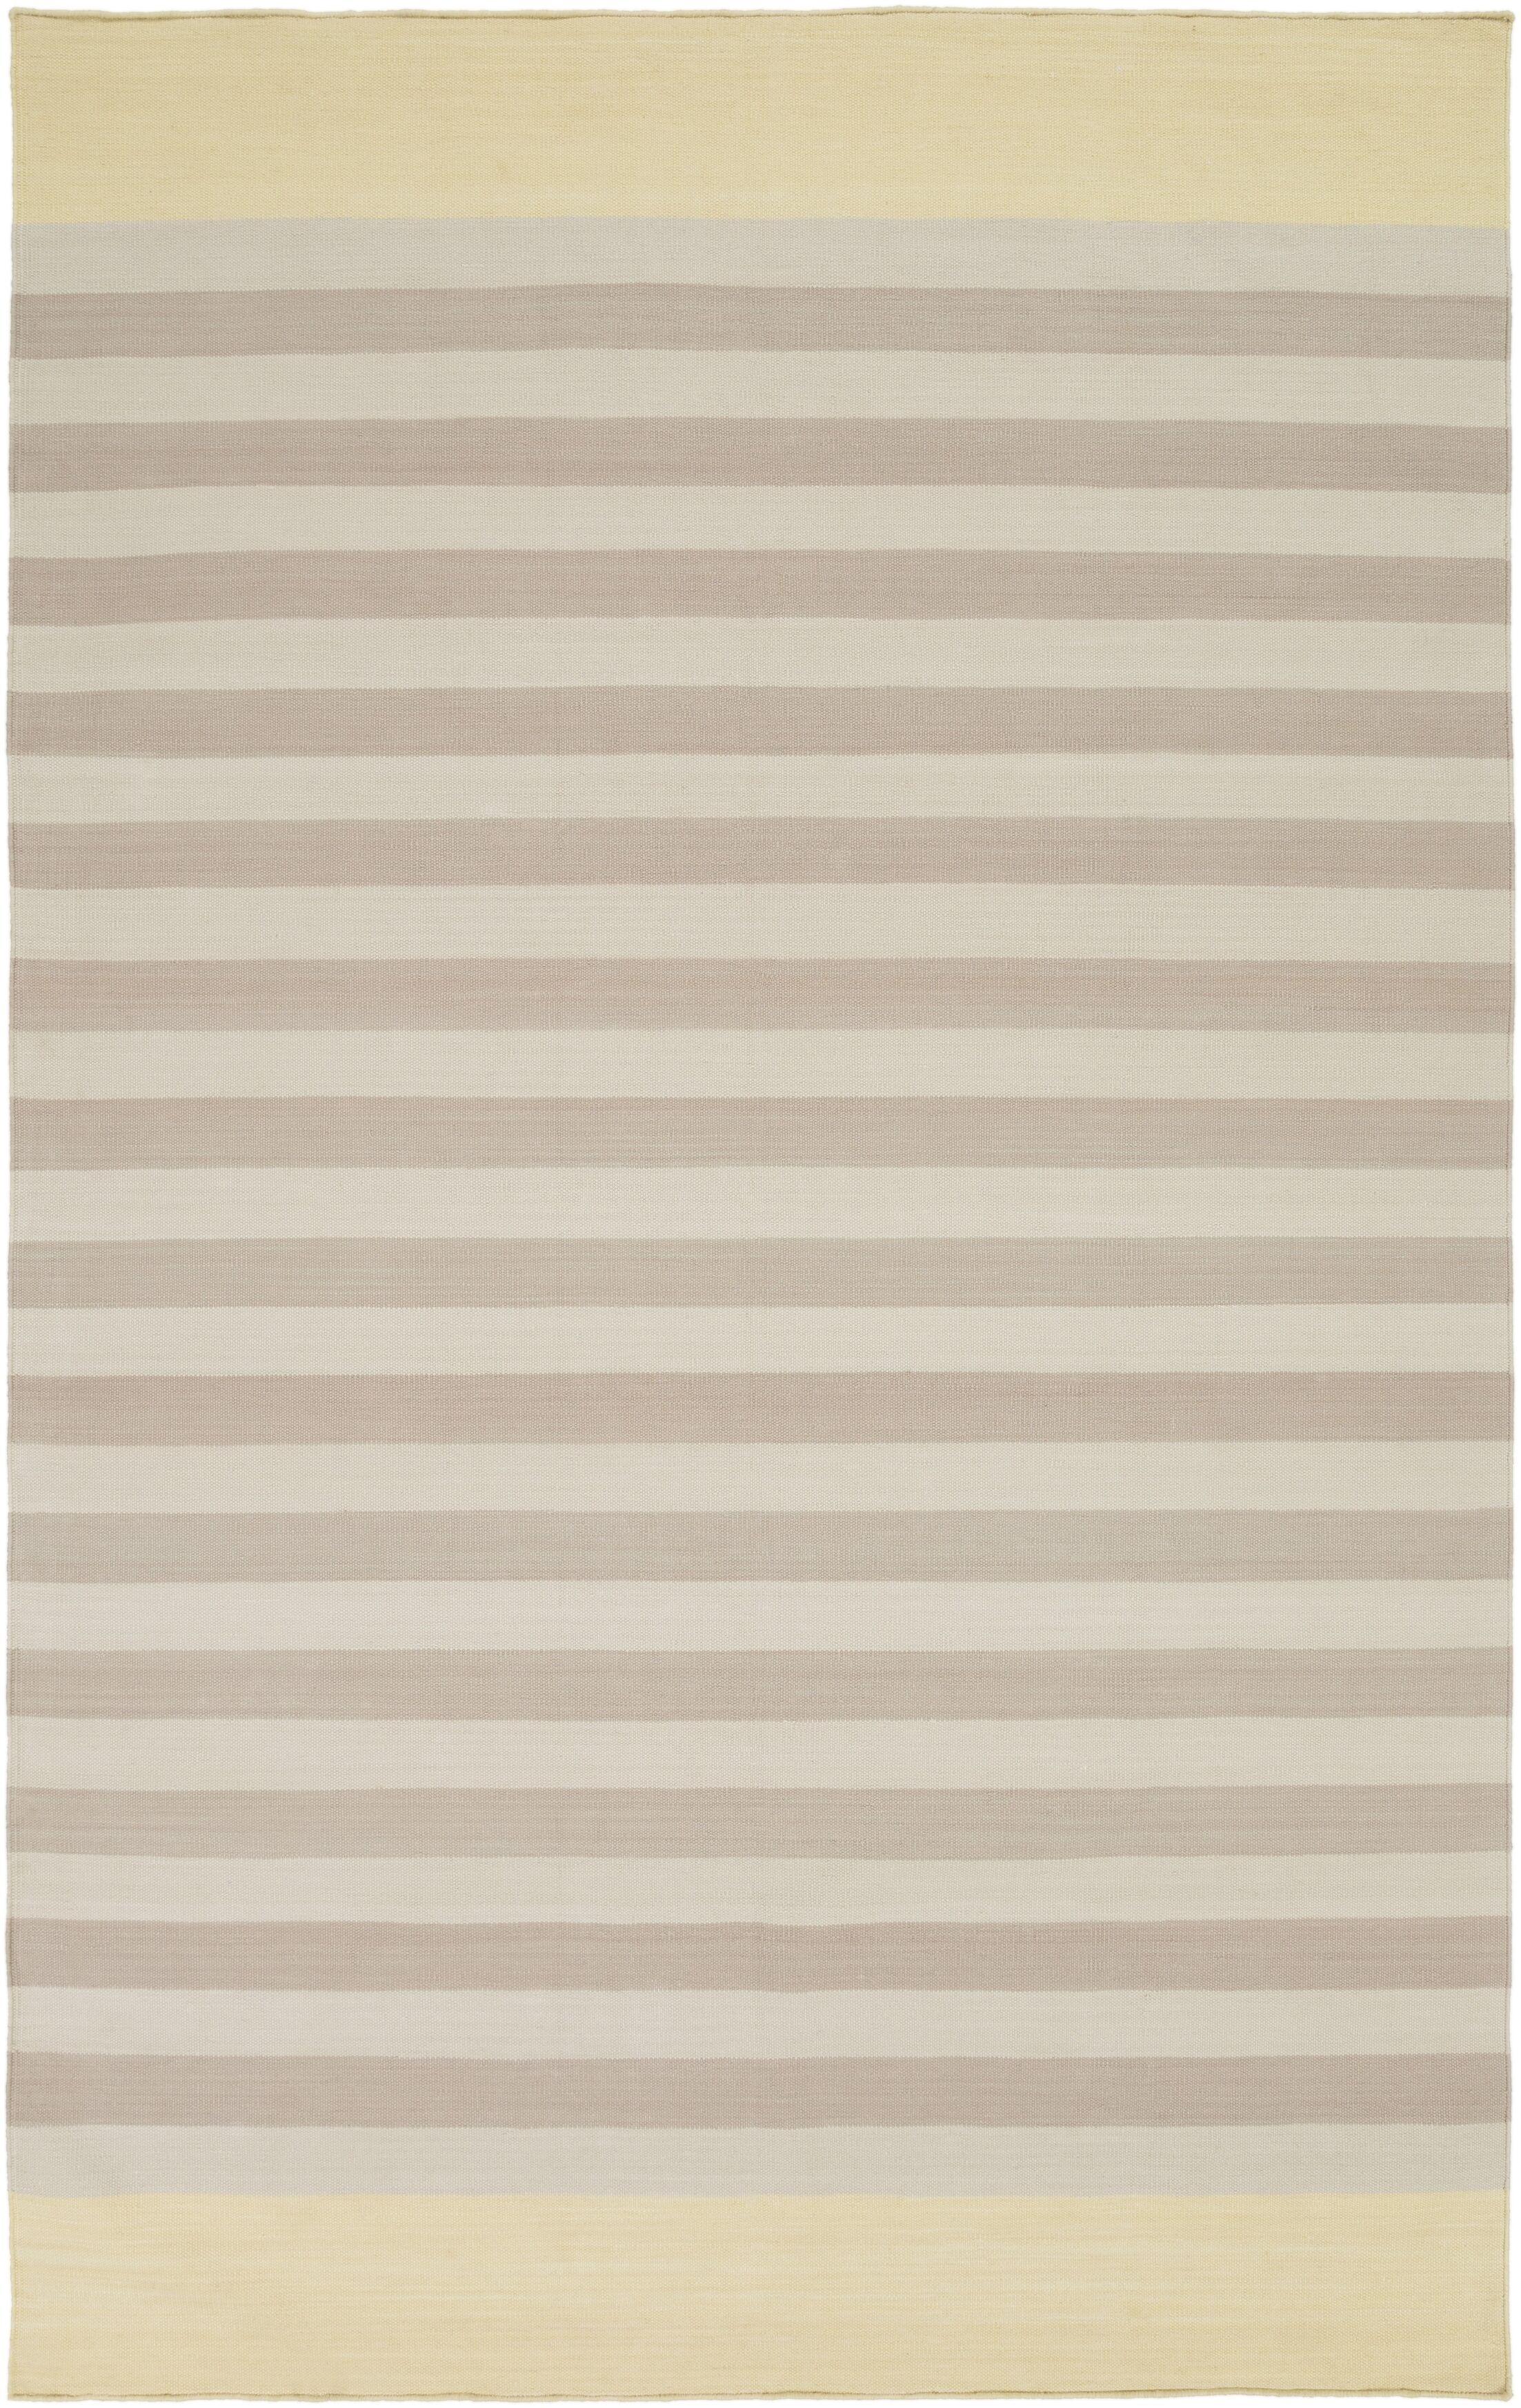 Kinslee Taupe/Light Gray Stripe Area Rug Rug Size: Rectangle 5' x 8'